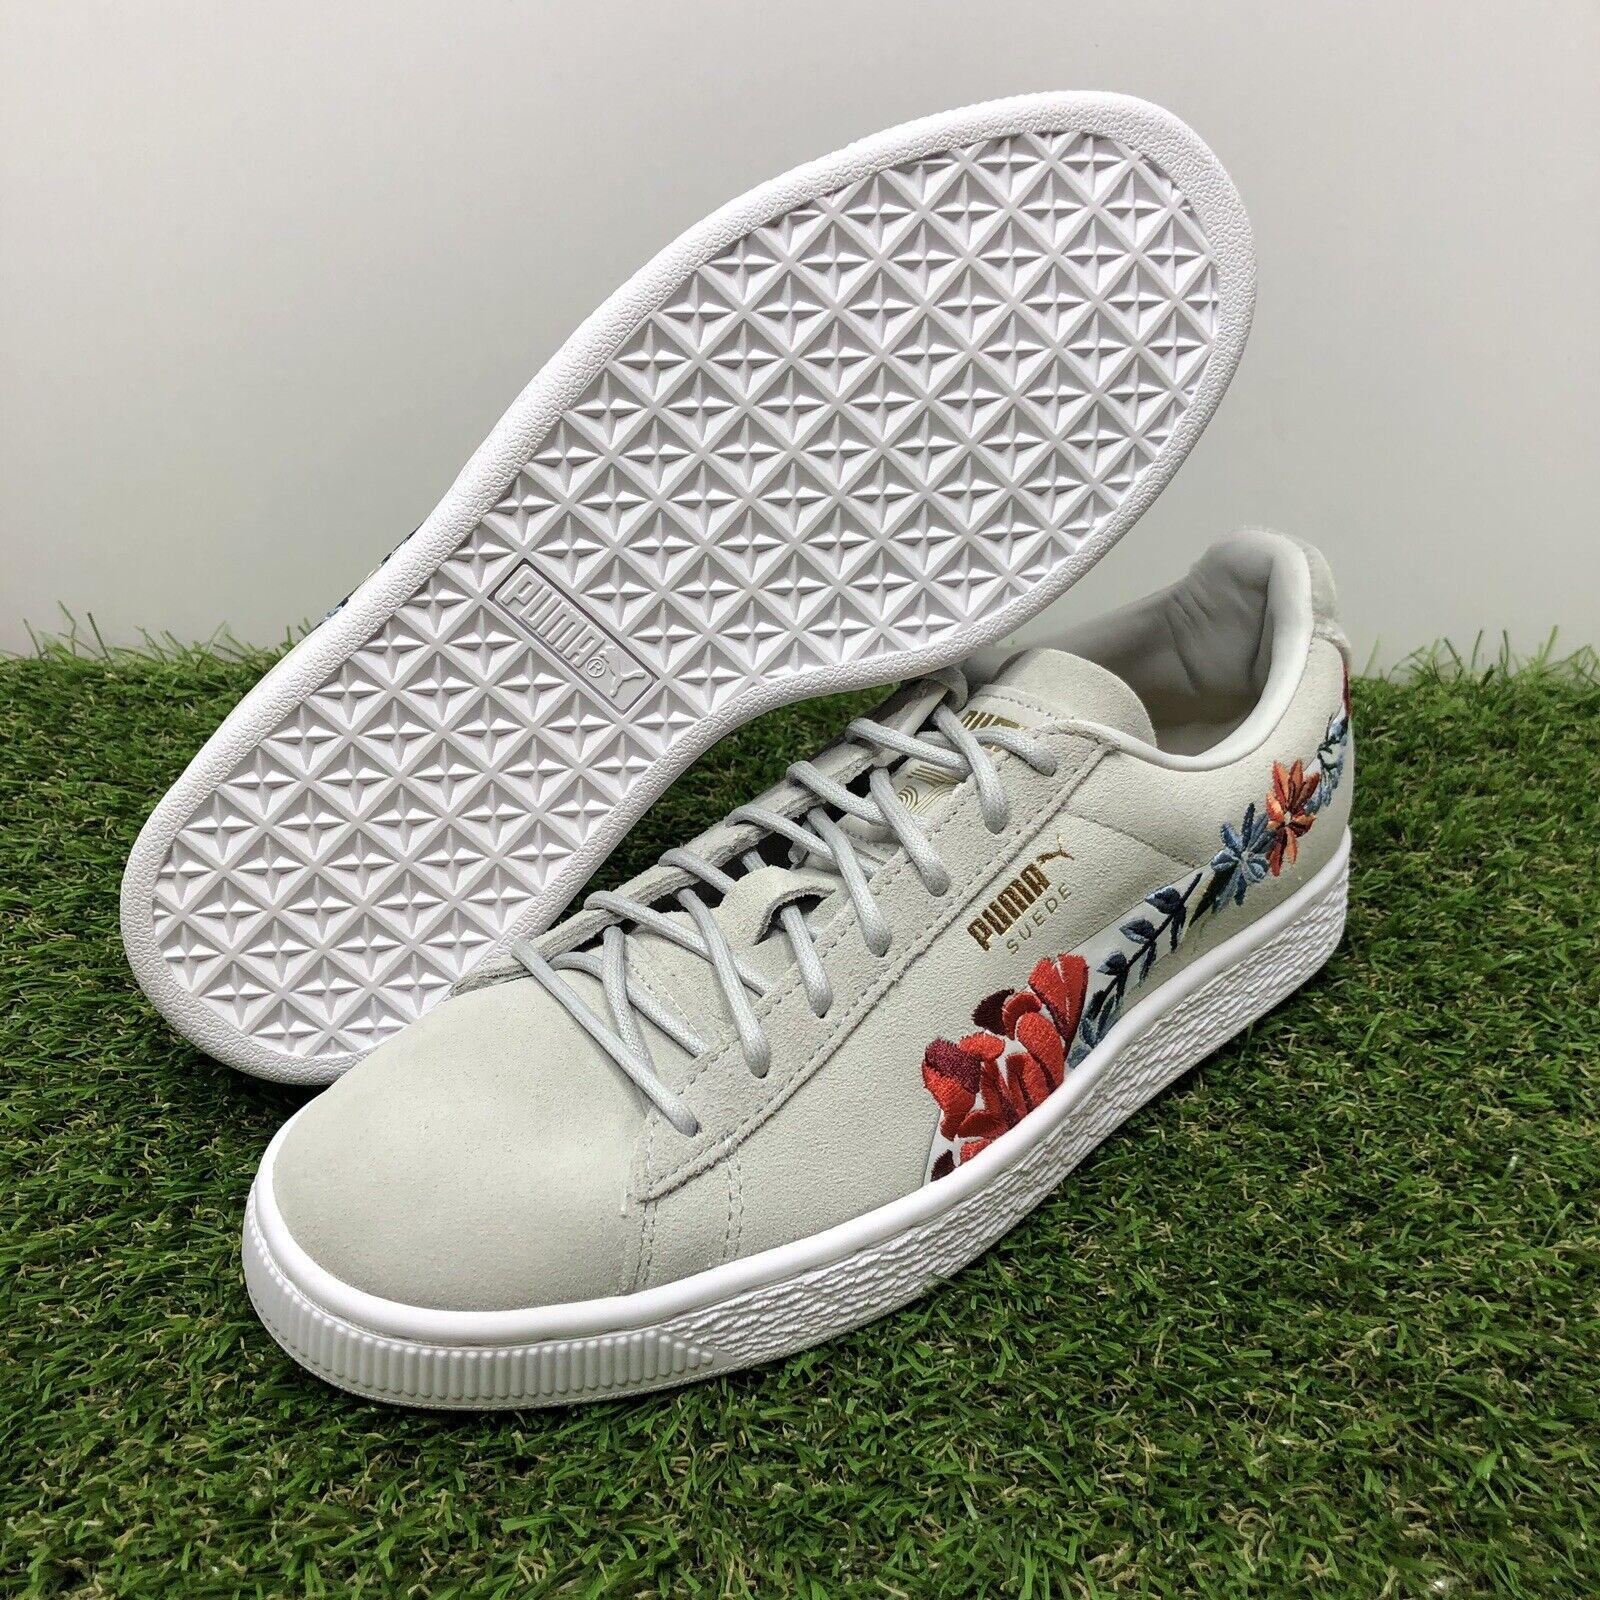 Puma Suede Velvet Hyper Embellished Floral 50th Womens 366124-02 Grey shoes Sz 8